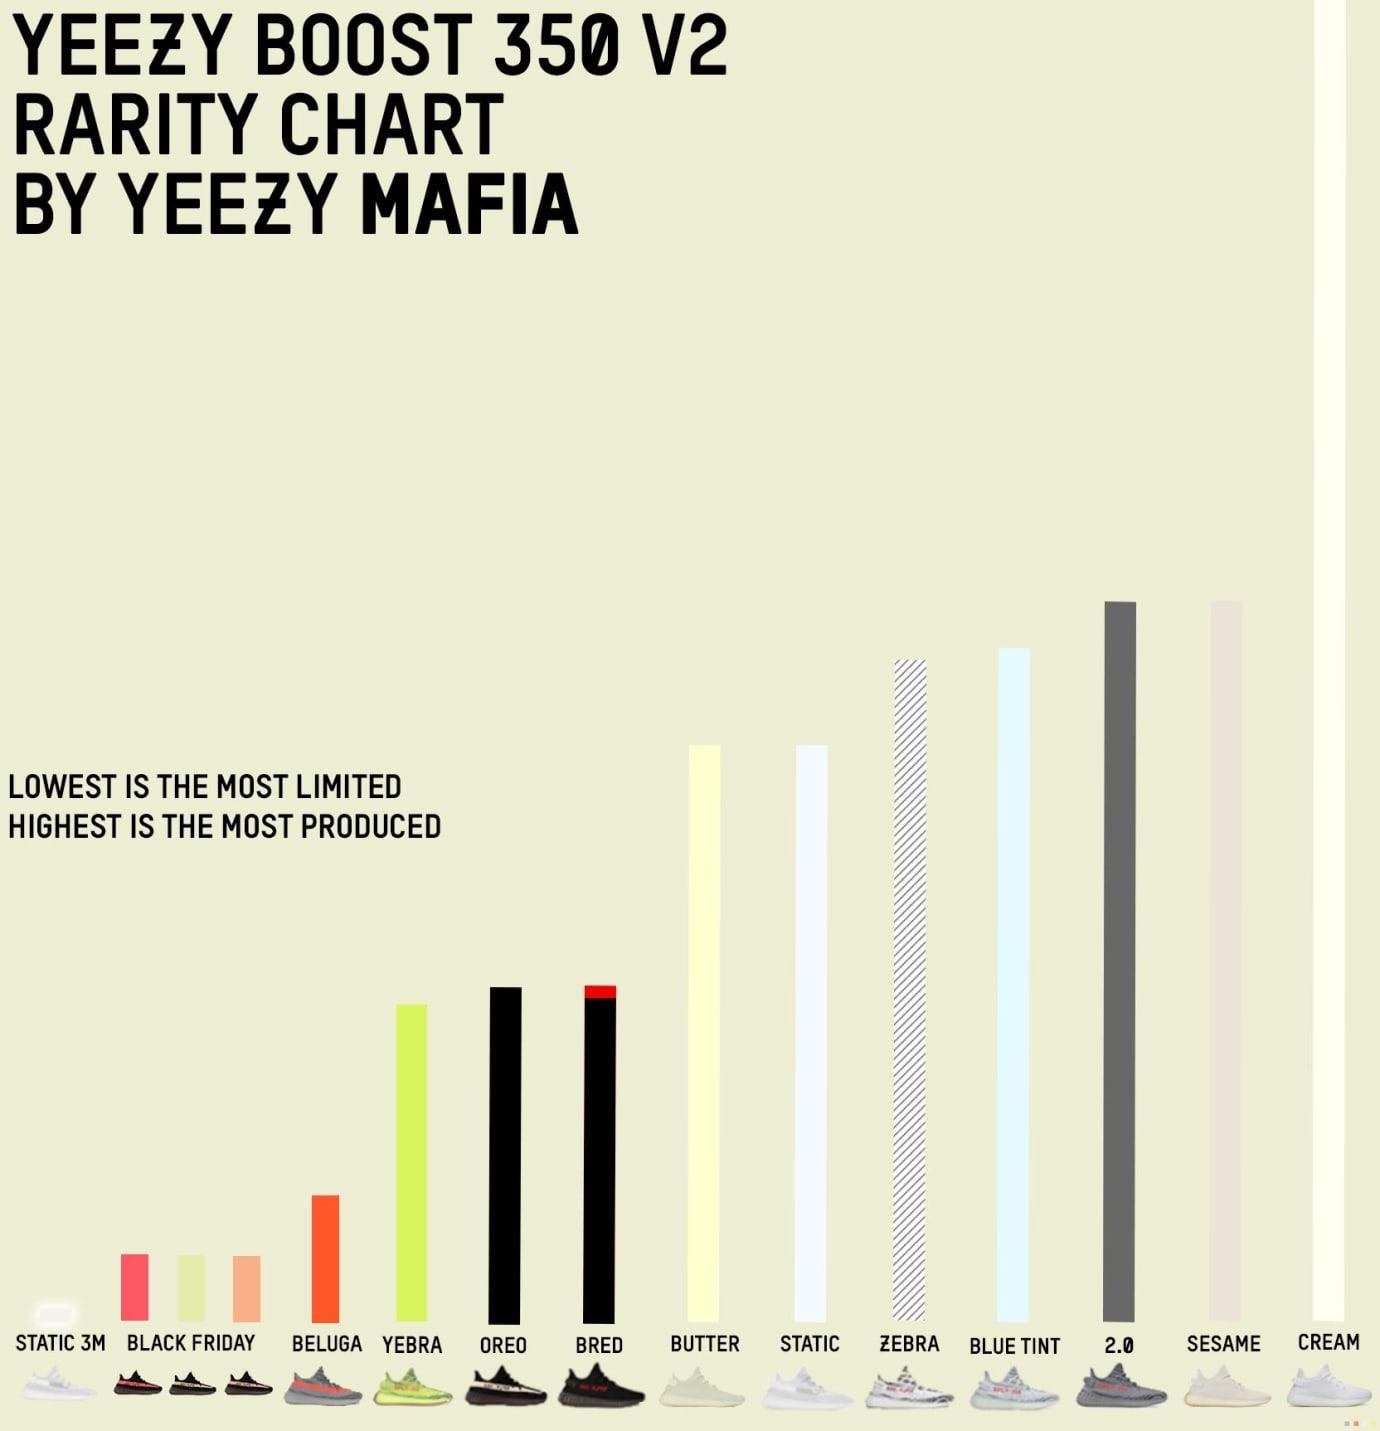 Yeezy Boost 350 V2 Rarity Chart